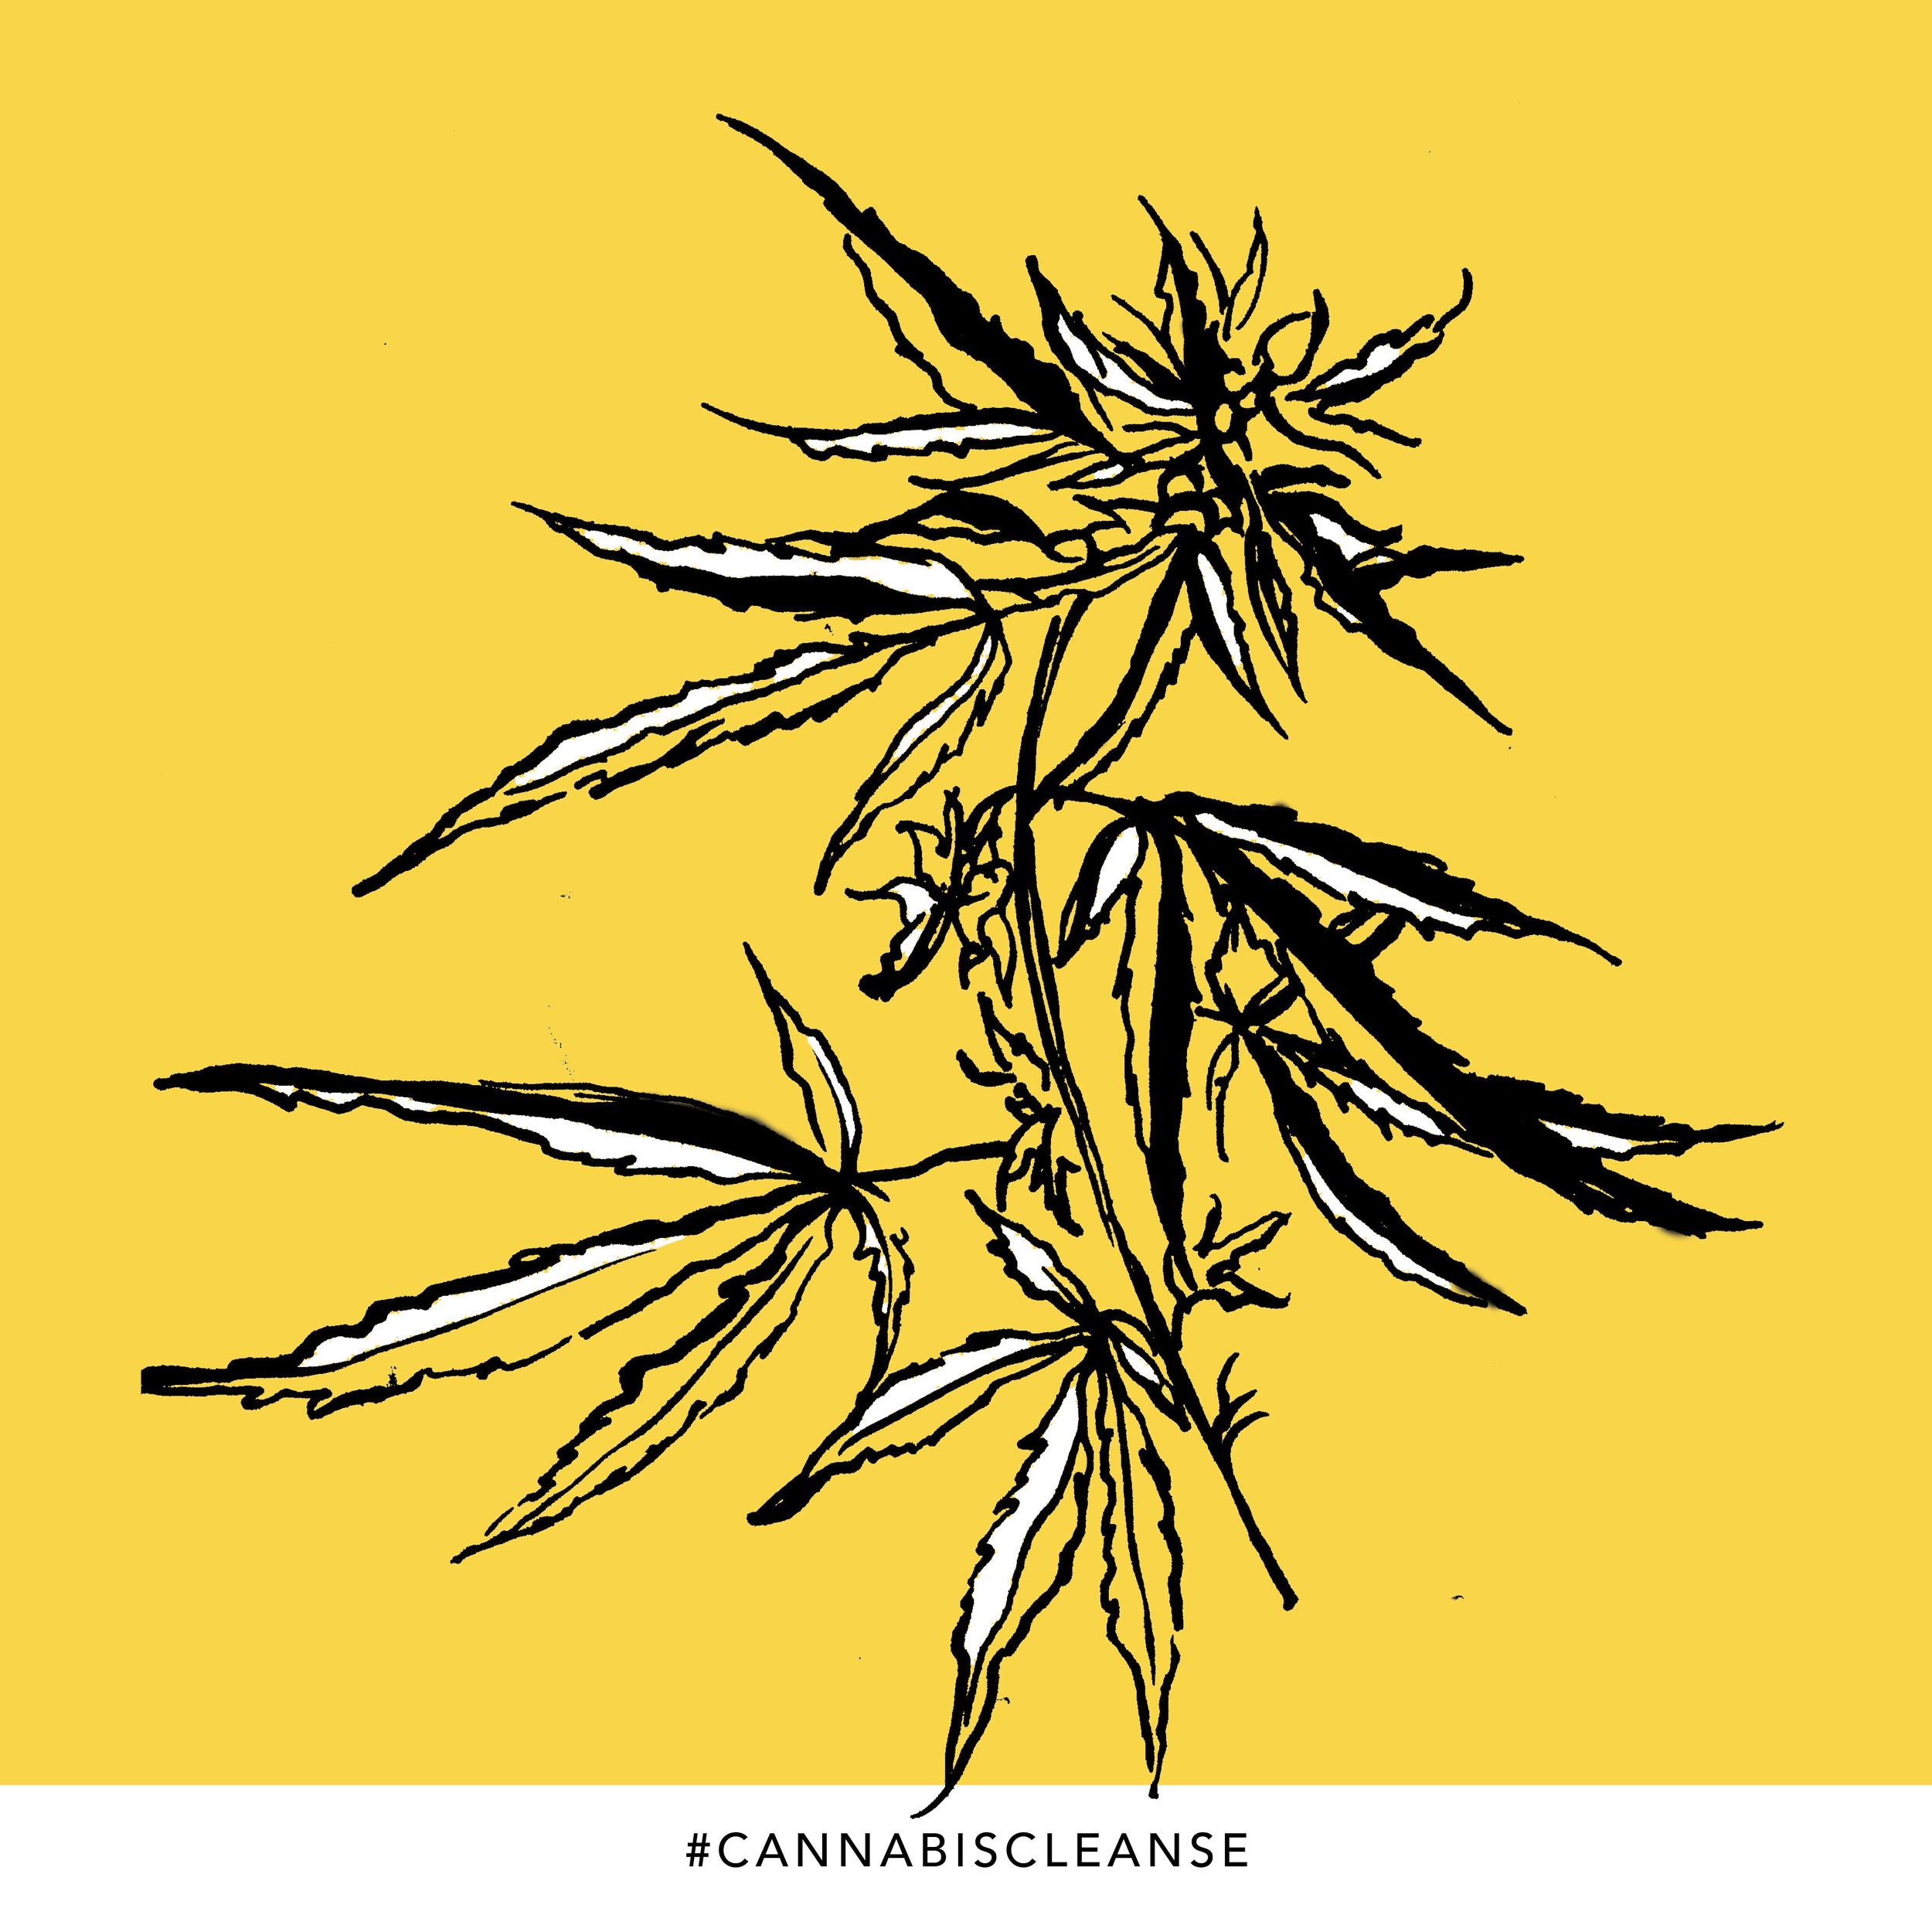 instagram-cannabiscleanse19.jpg